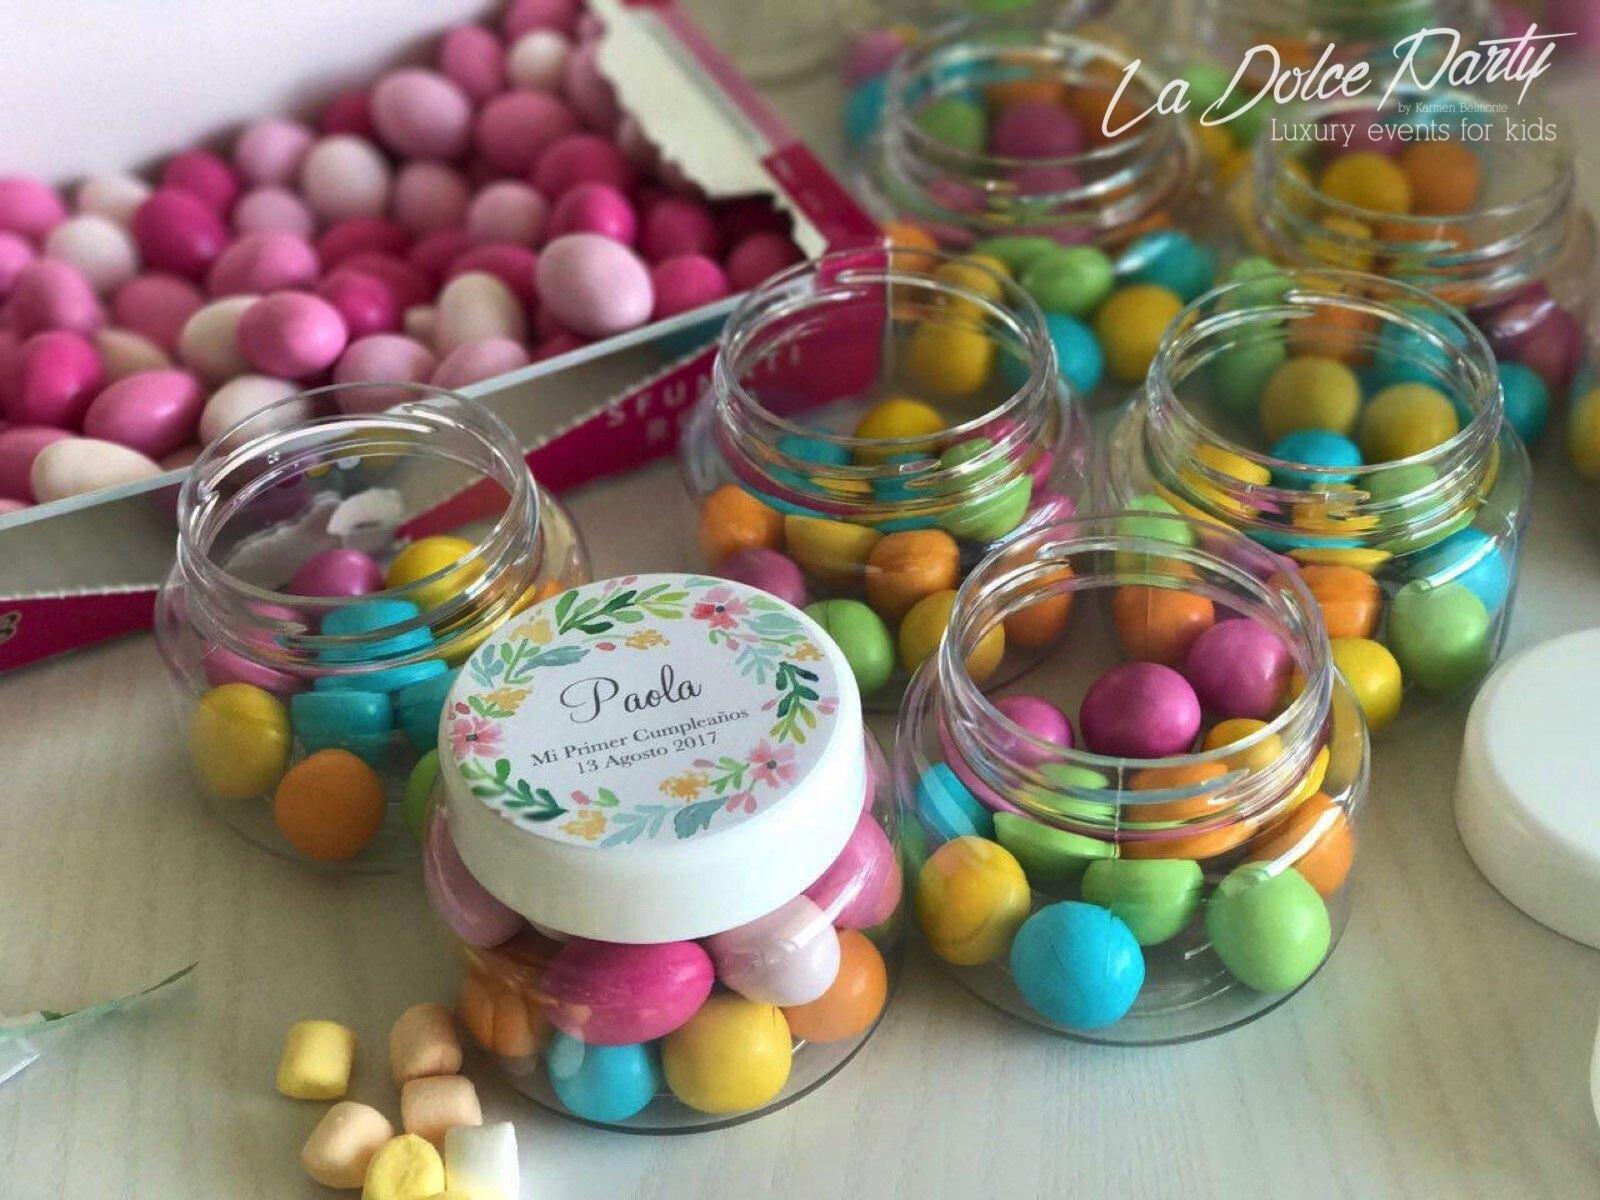 Chuches gourmet como detalles para invitados la dolce - Detalles de fiesta ...